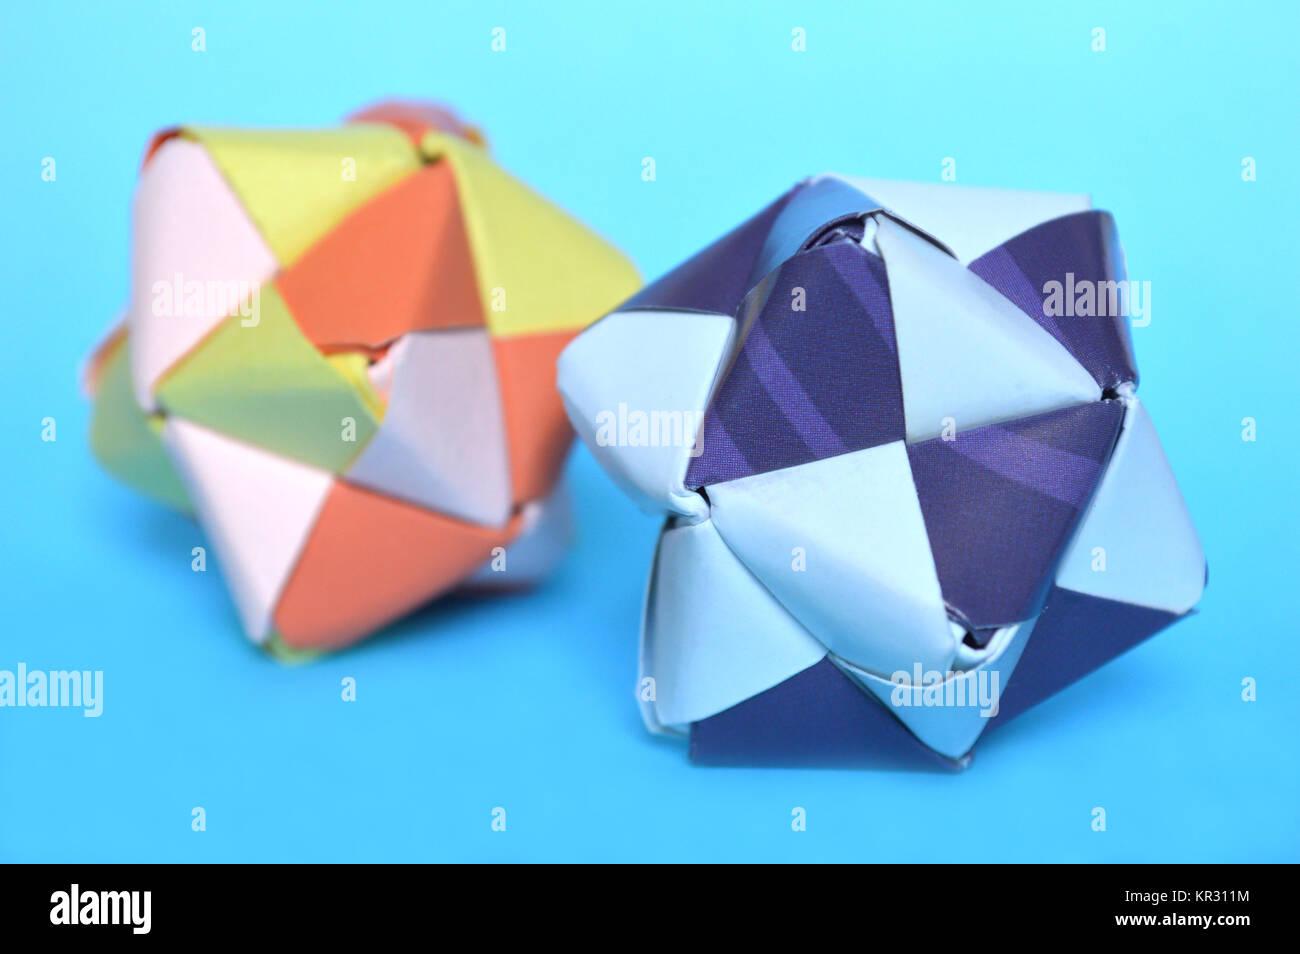 Modular Origami Sonobe Ball On Blue Background